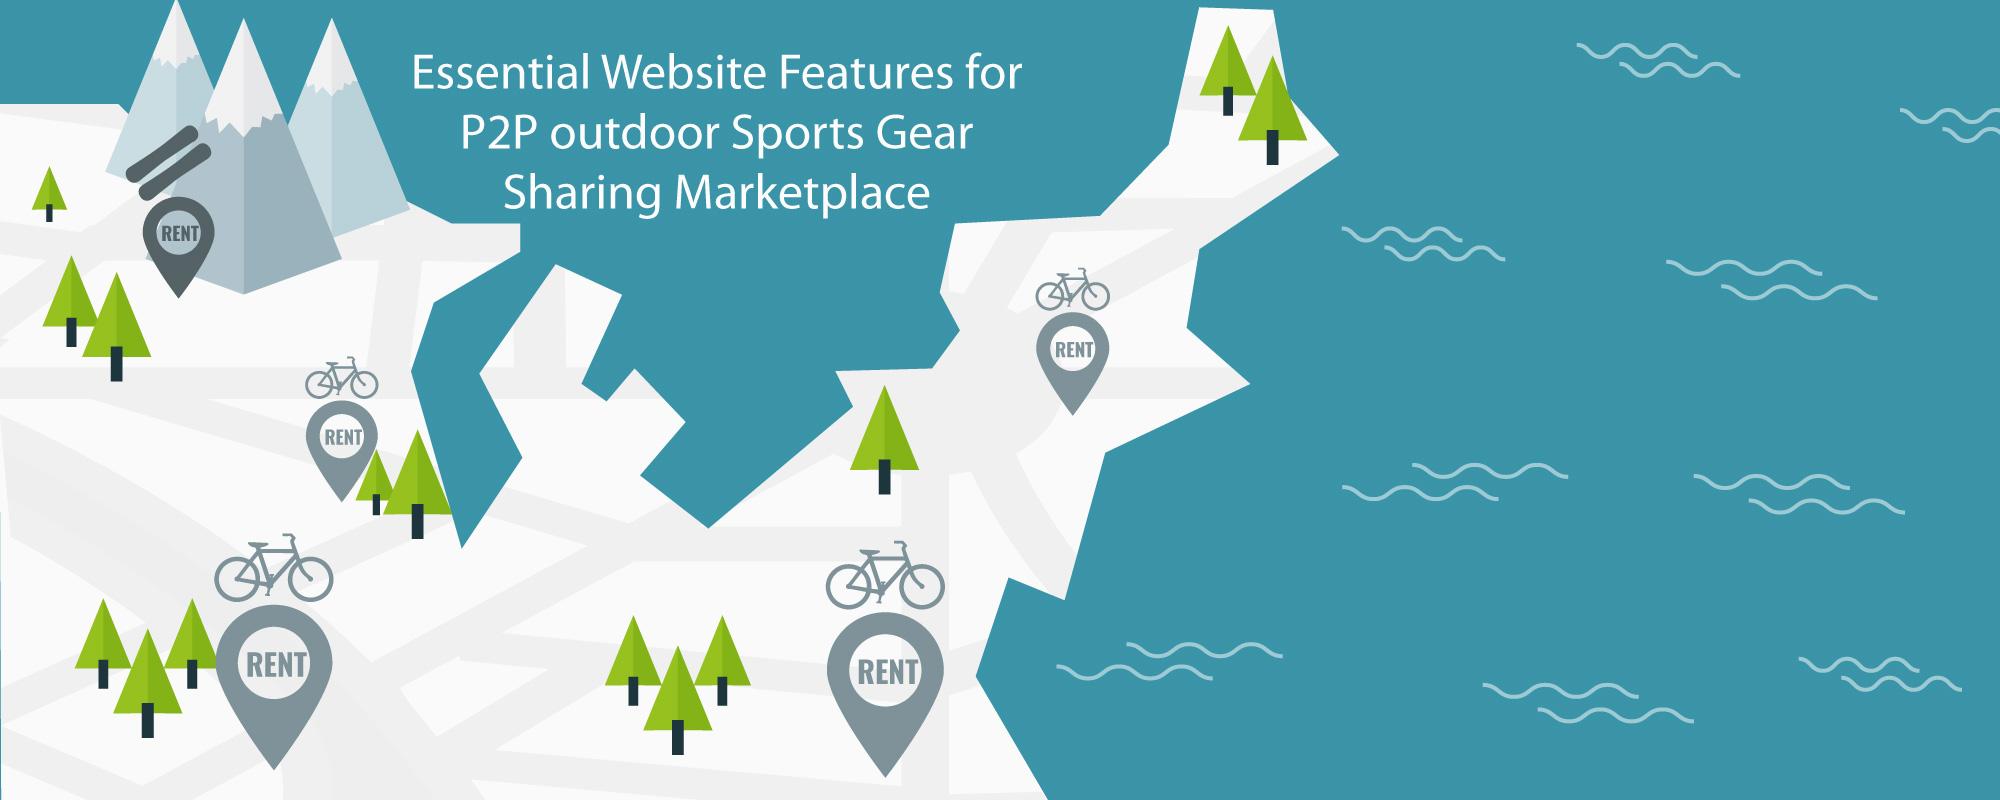 Build P2P Online Bike  Rental Marketplace – Business Model & Key Features Analysis